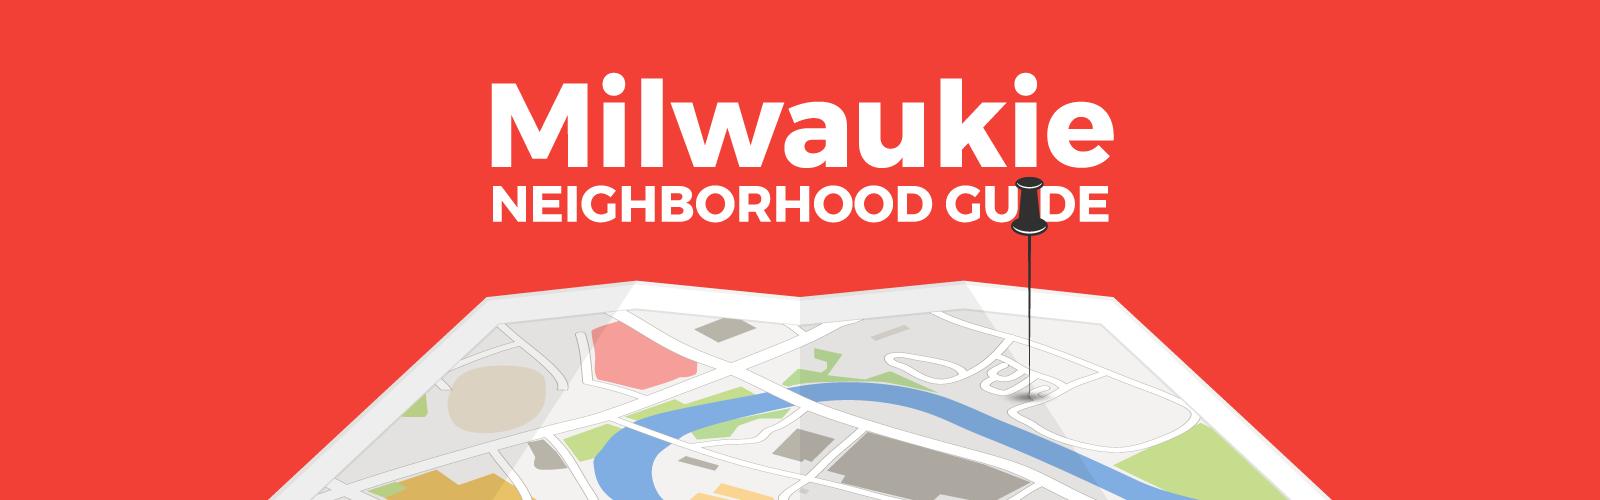 Milwaukie Portland Neighborhood Guide